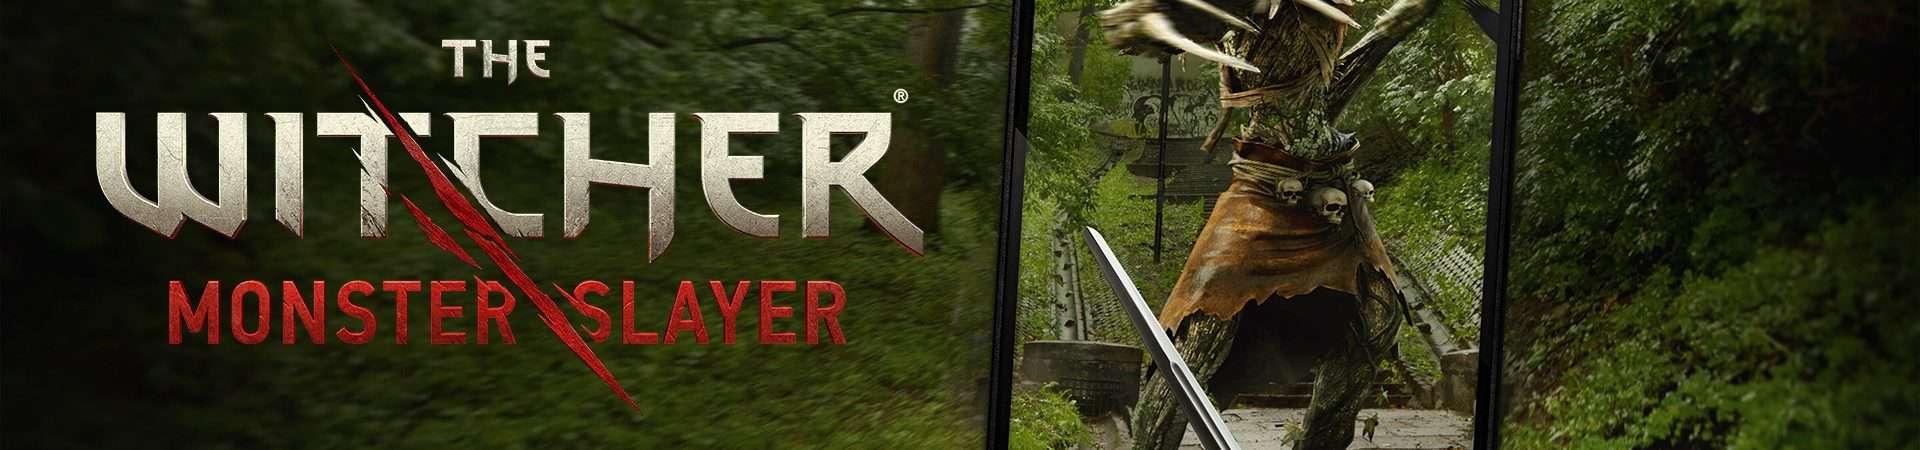 Imagem promocional de The Witcher Monster Slayer